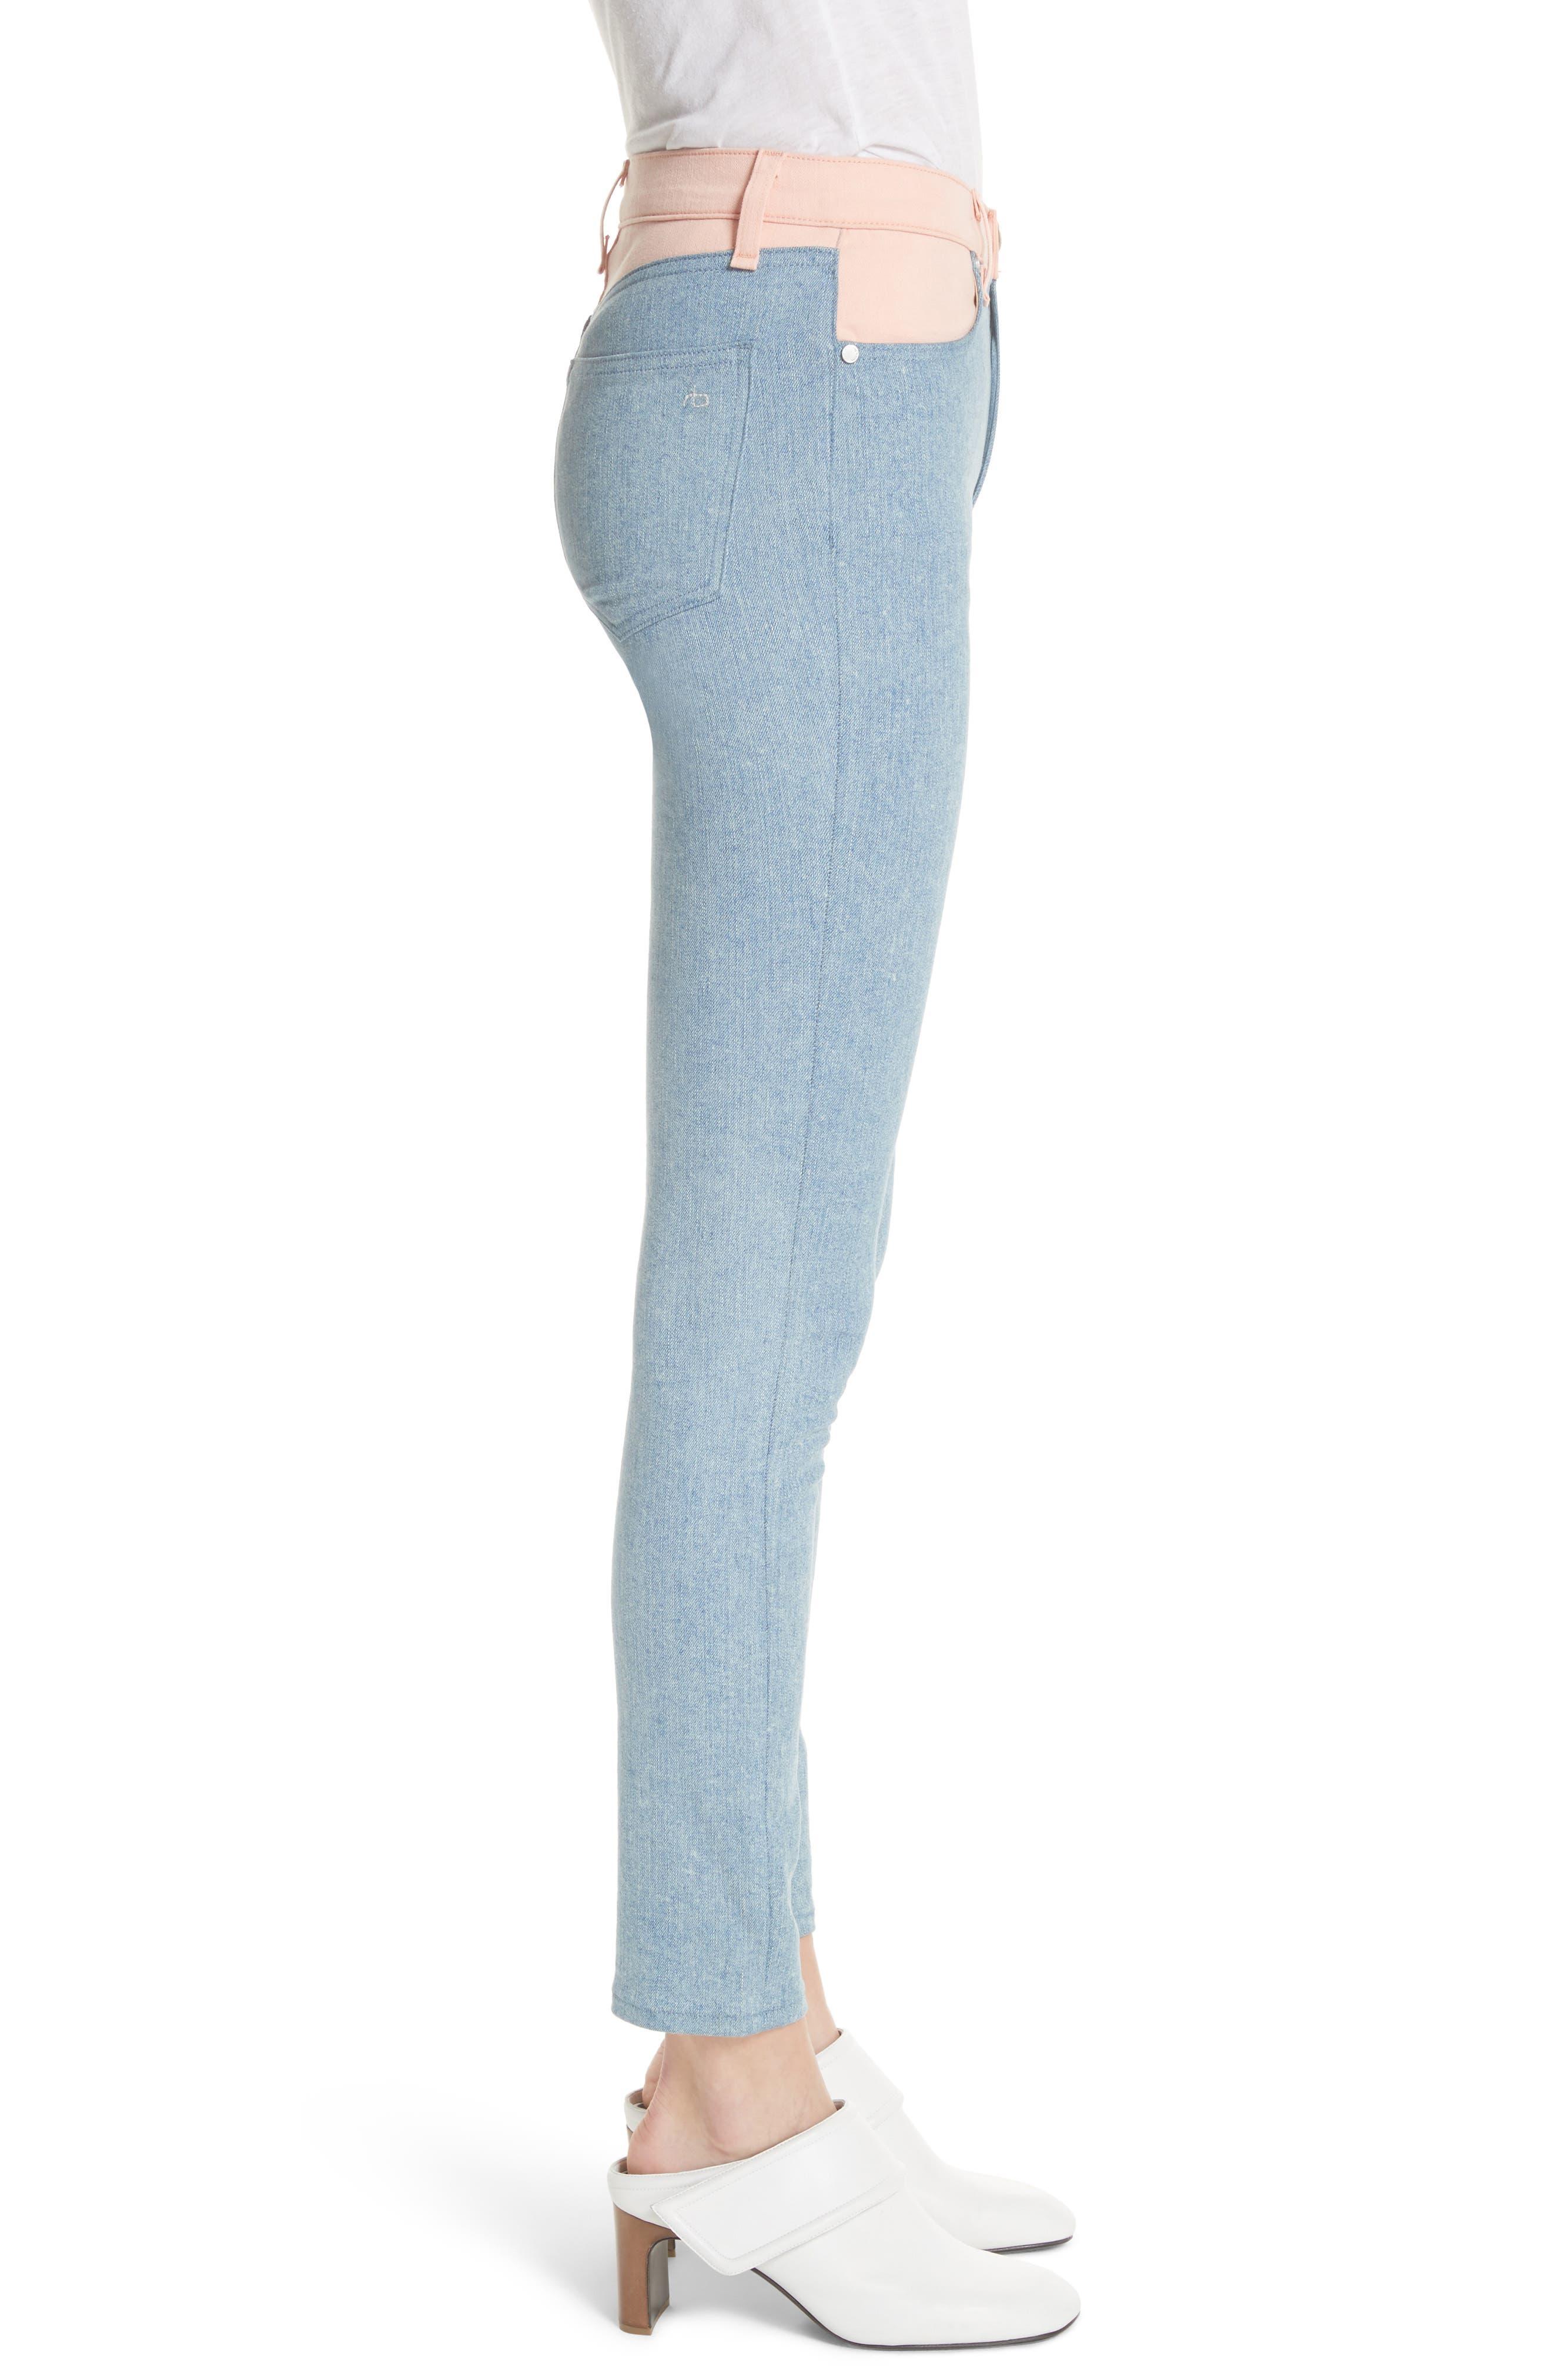 Phila Skinny Jeans,                             Alternate thumbnail 3, color,                             Nelly/ Prairie